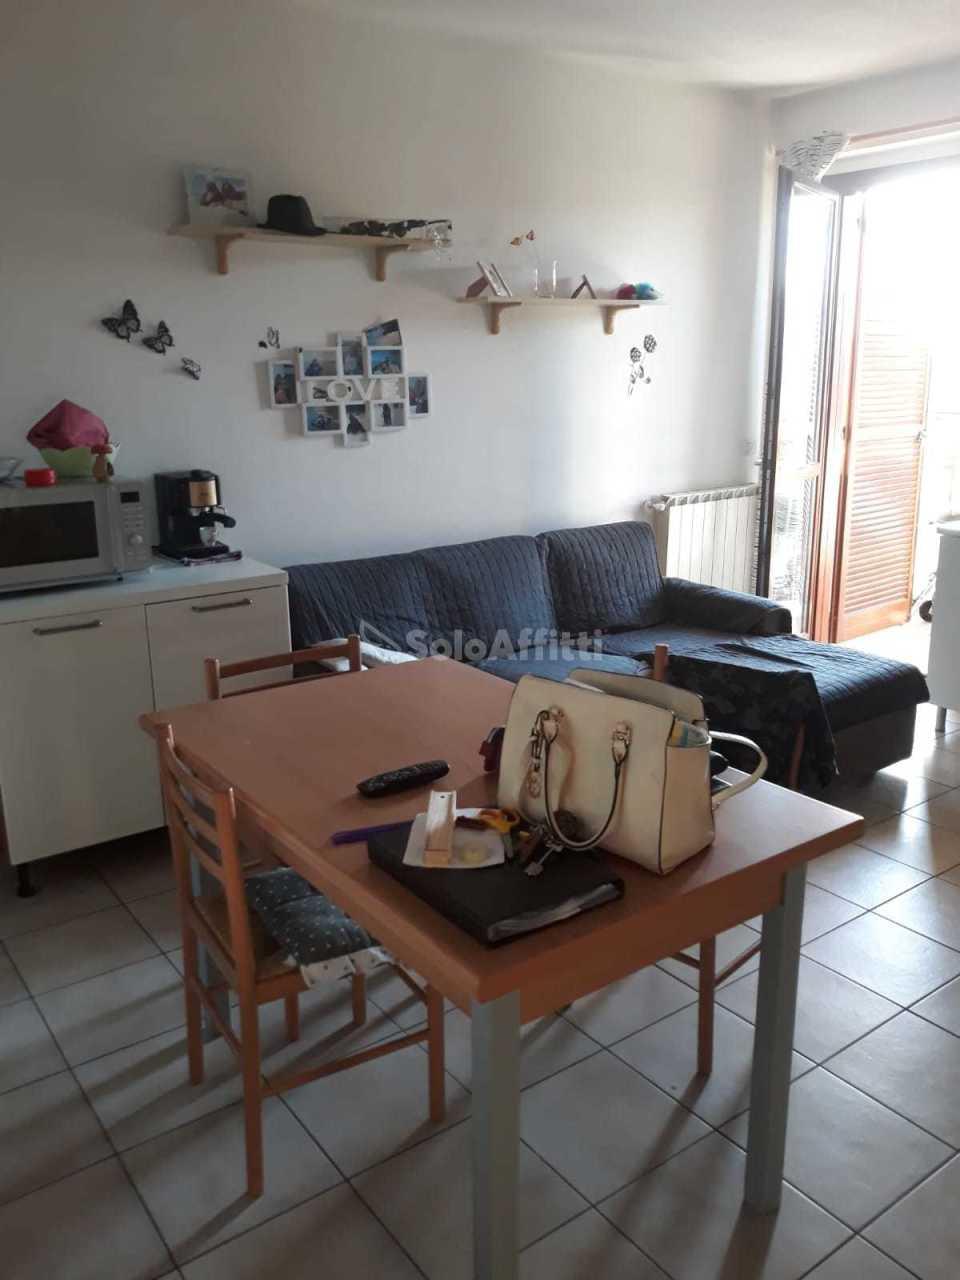 Appartamento, 65 Mq, Affitto - Grosseto (Grosseto)